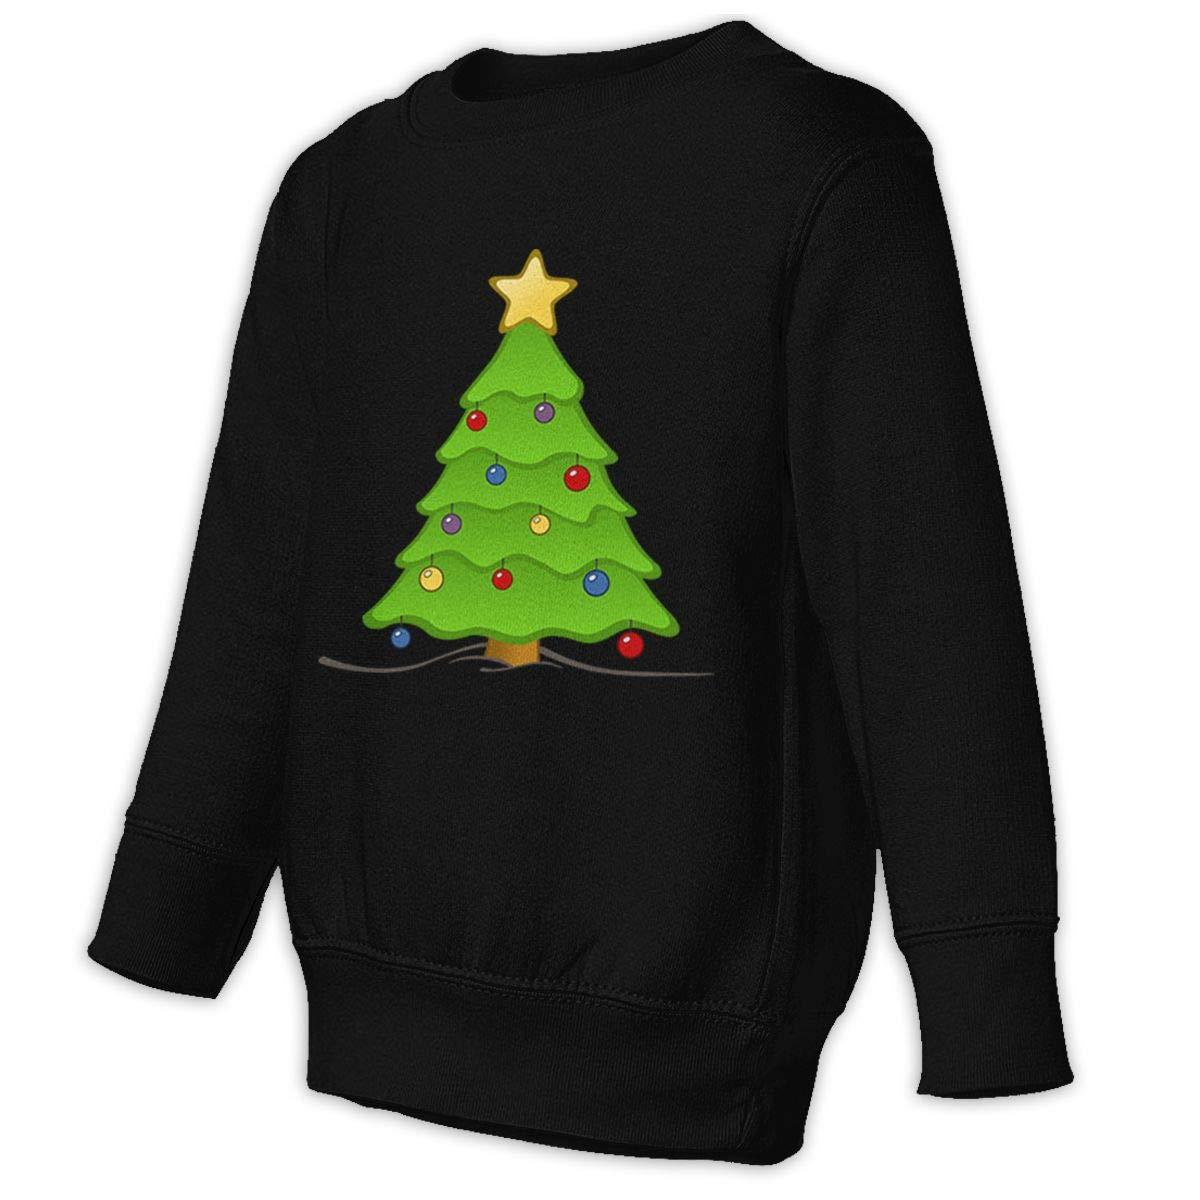 NMDJC CCQ Christmas Tree Decoration Baby Sweatshirt Fashion Kids Hoodies Cotton T Shirts